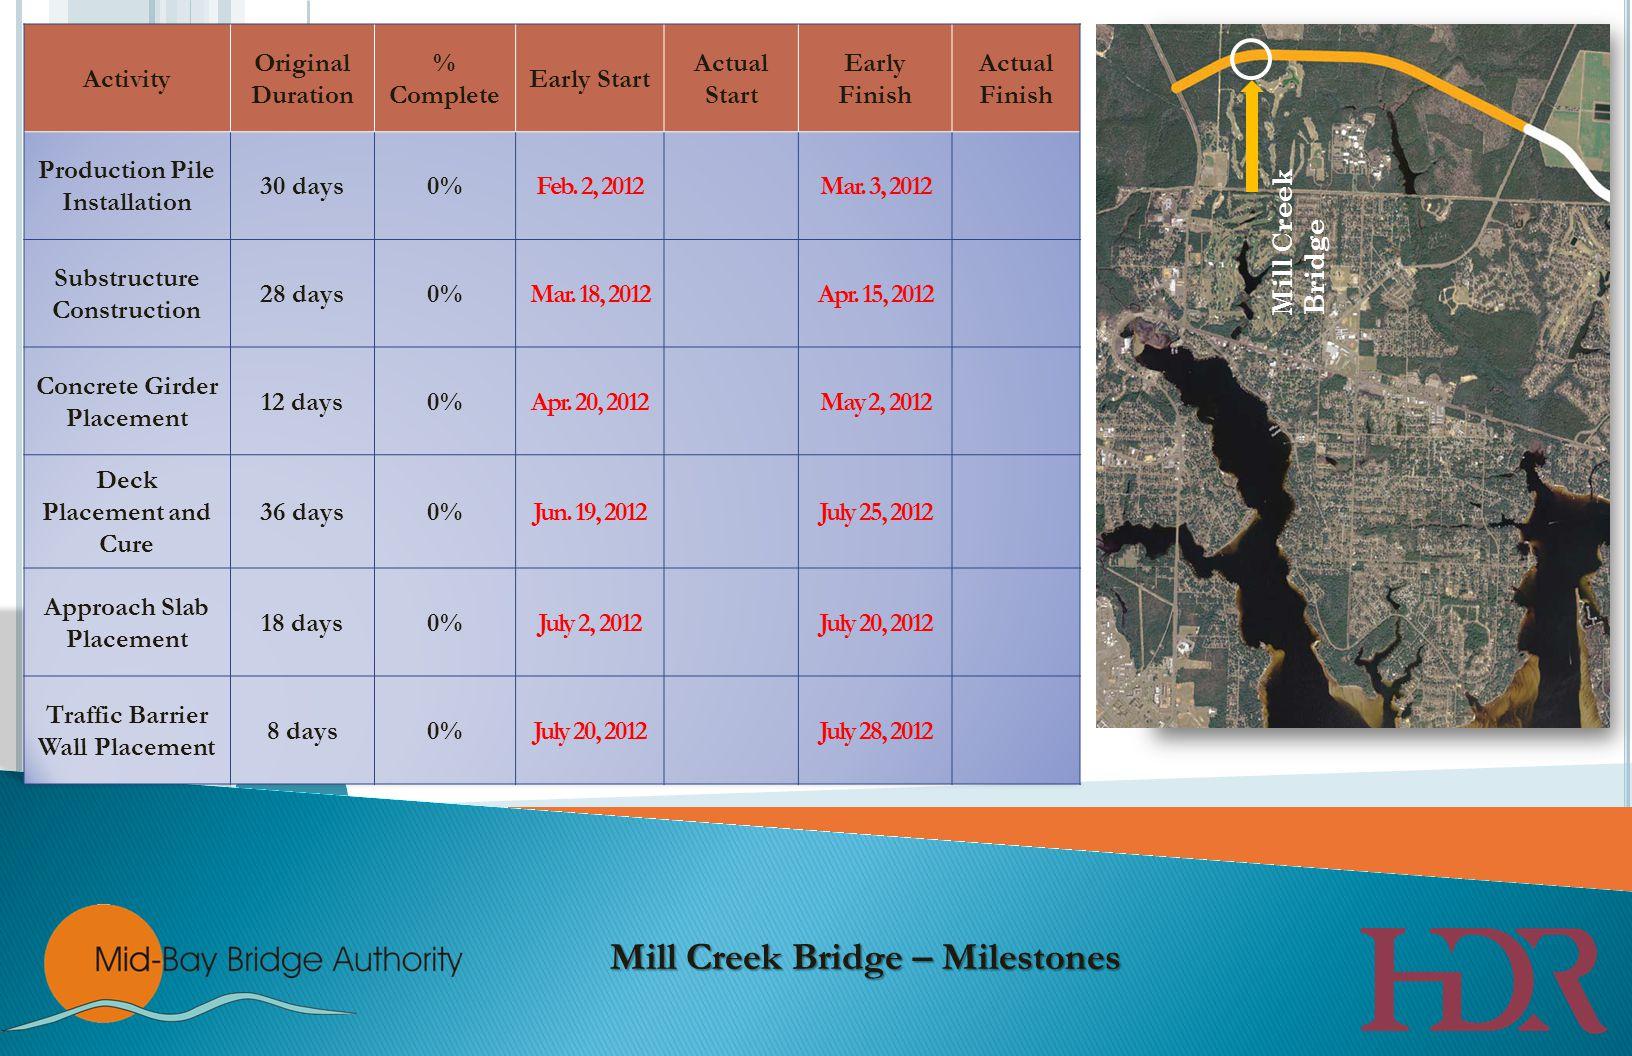 Range Road Bridge Mill Creek Bridge – Milestones Mill Creek Bridge